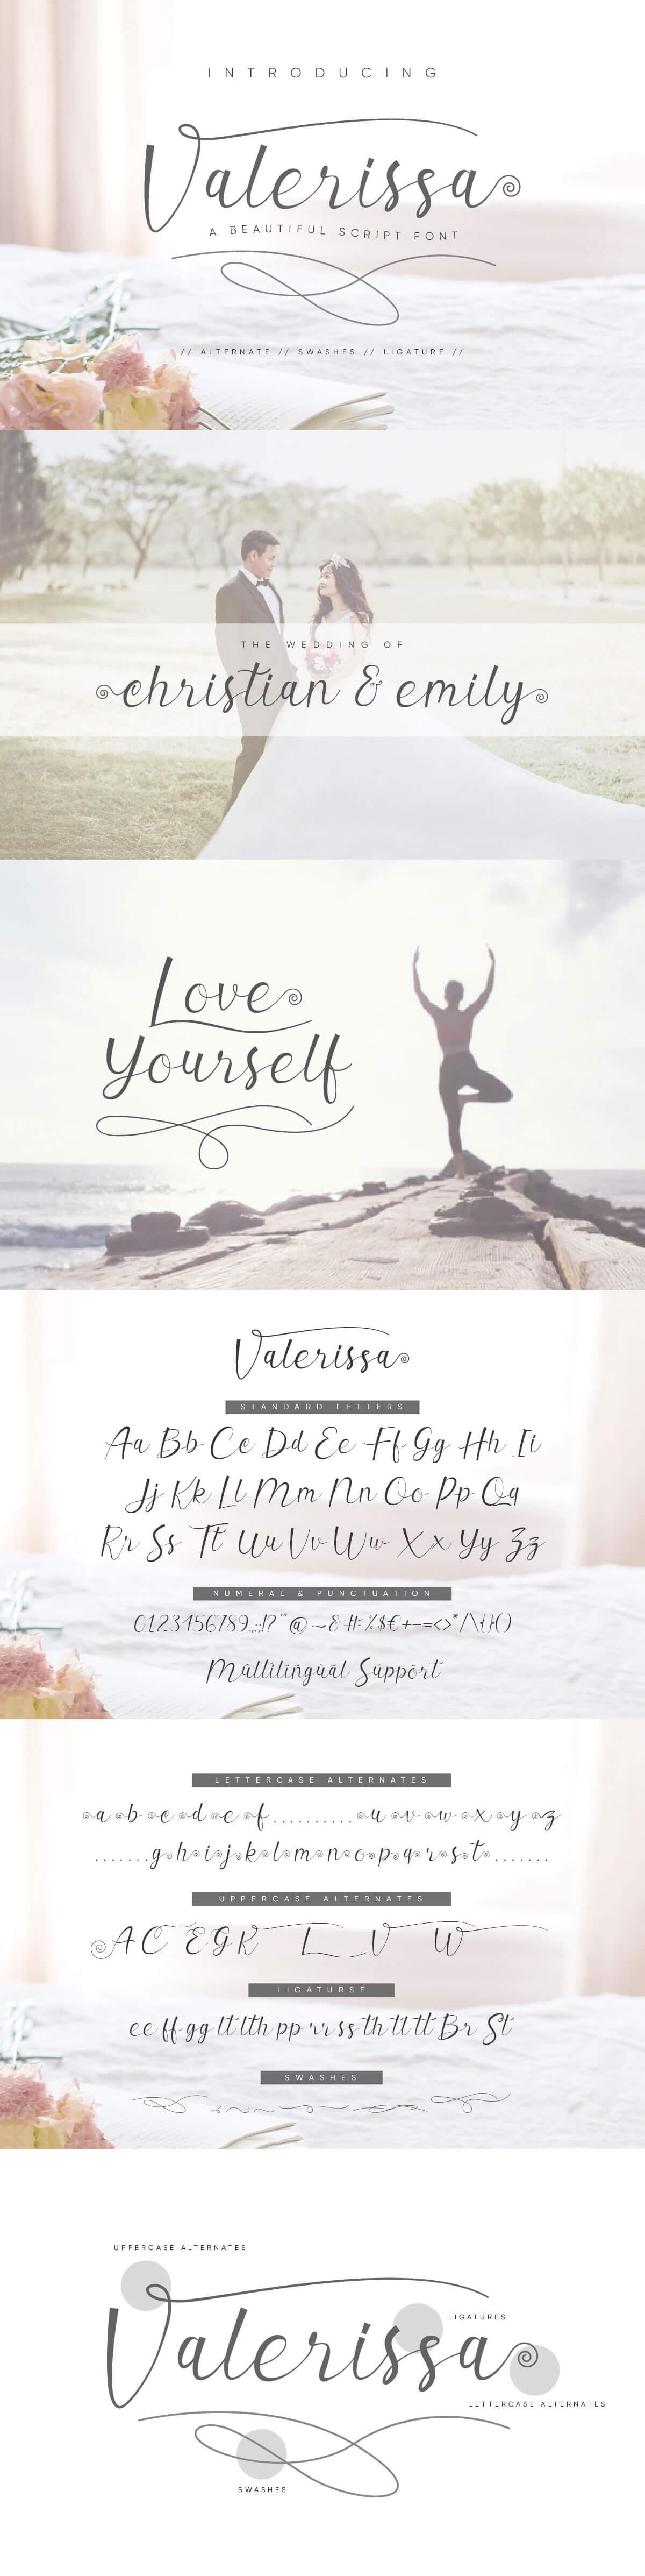 Free Valerissa Script Font